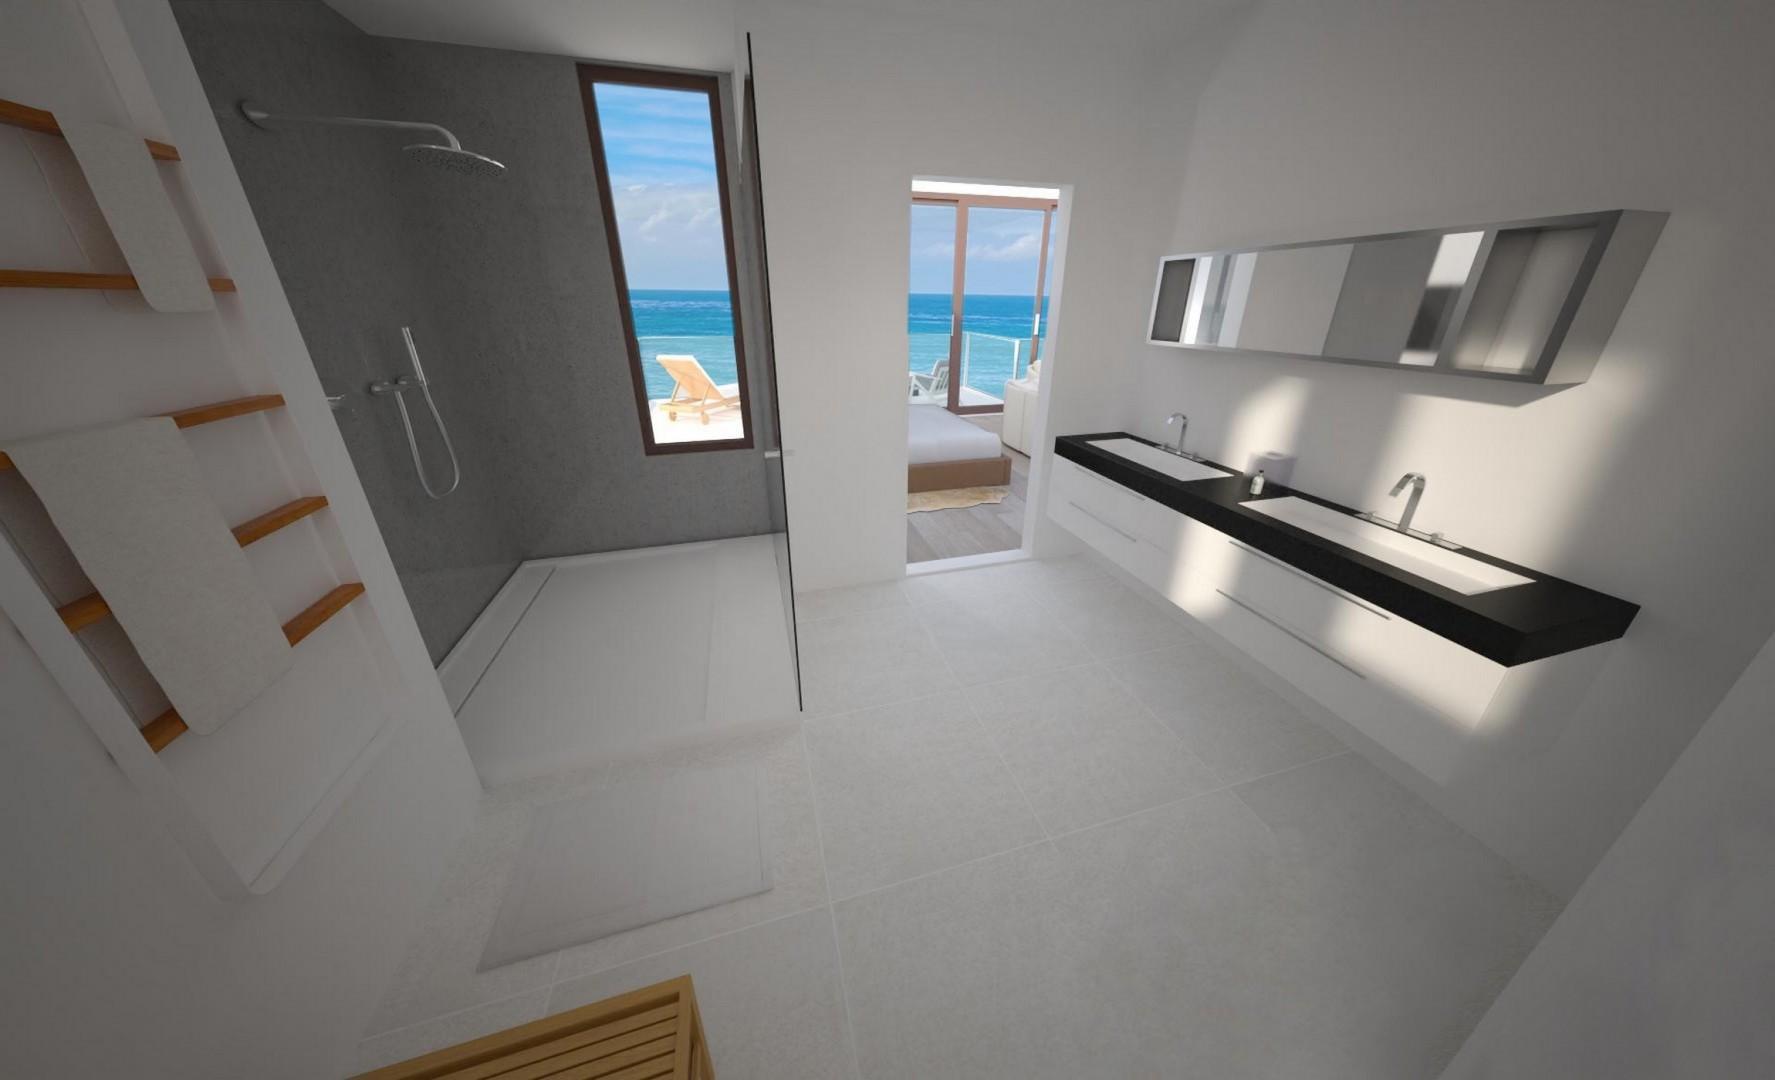 Primary Suite Bathroom with ocean views